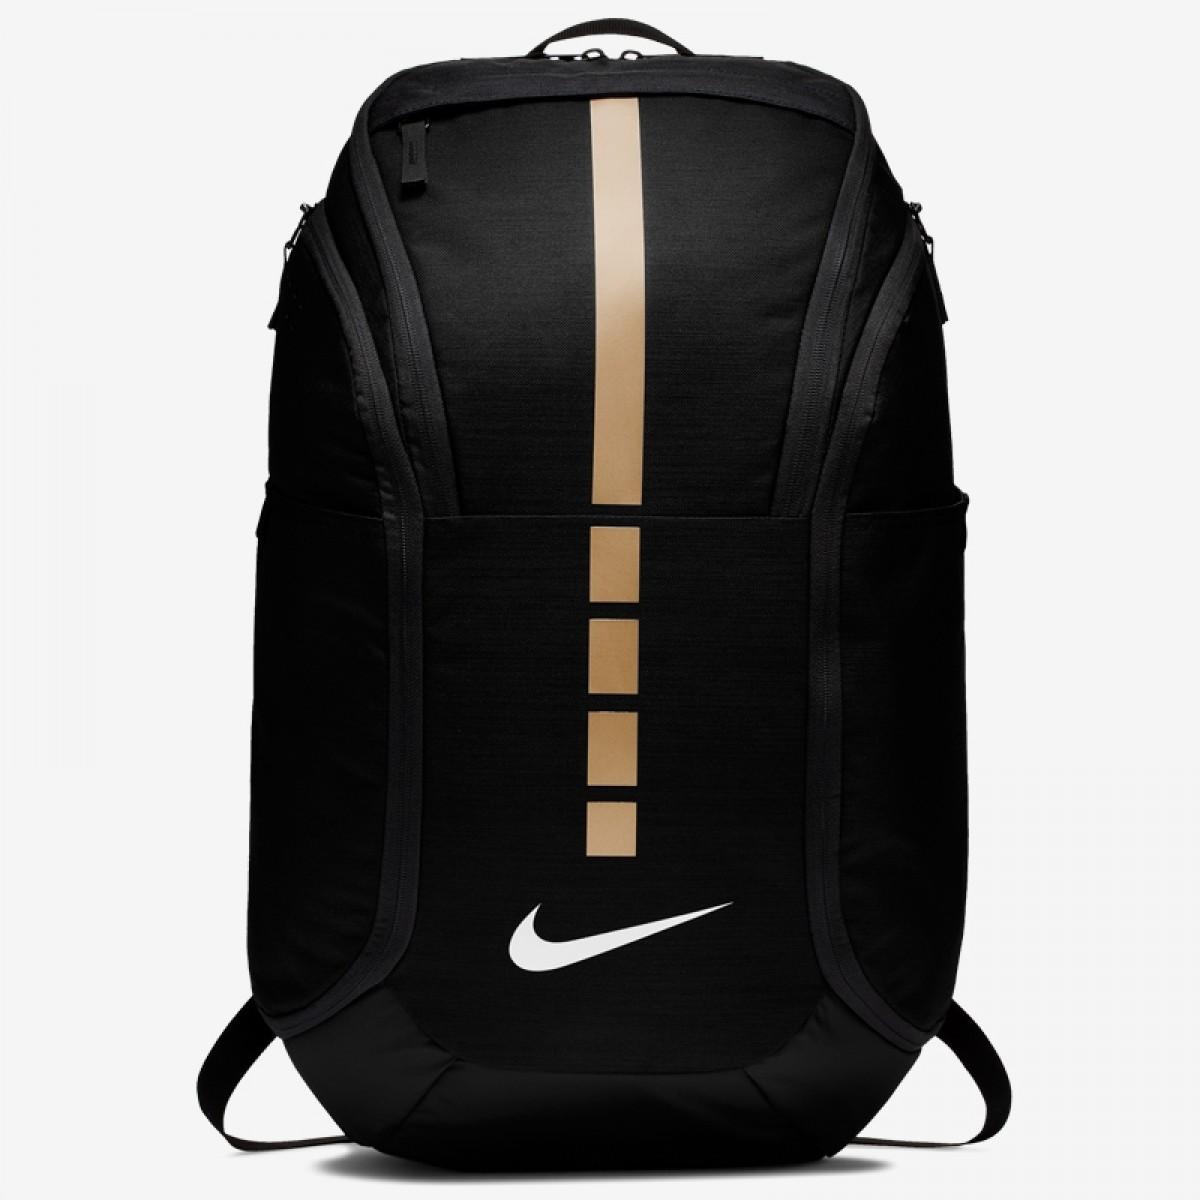 Nike Hoops Elite Pro Backpack 'Black Gold'